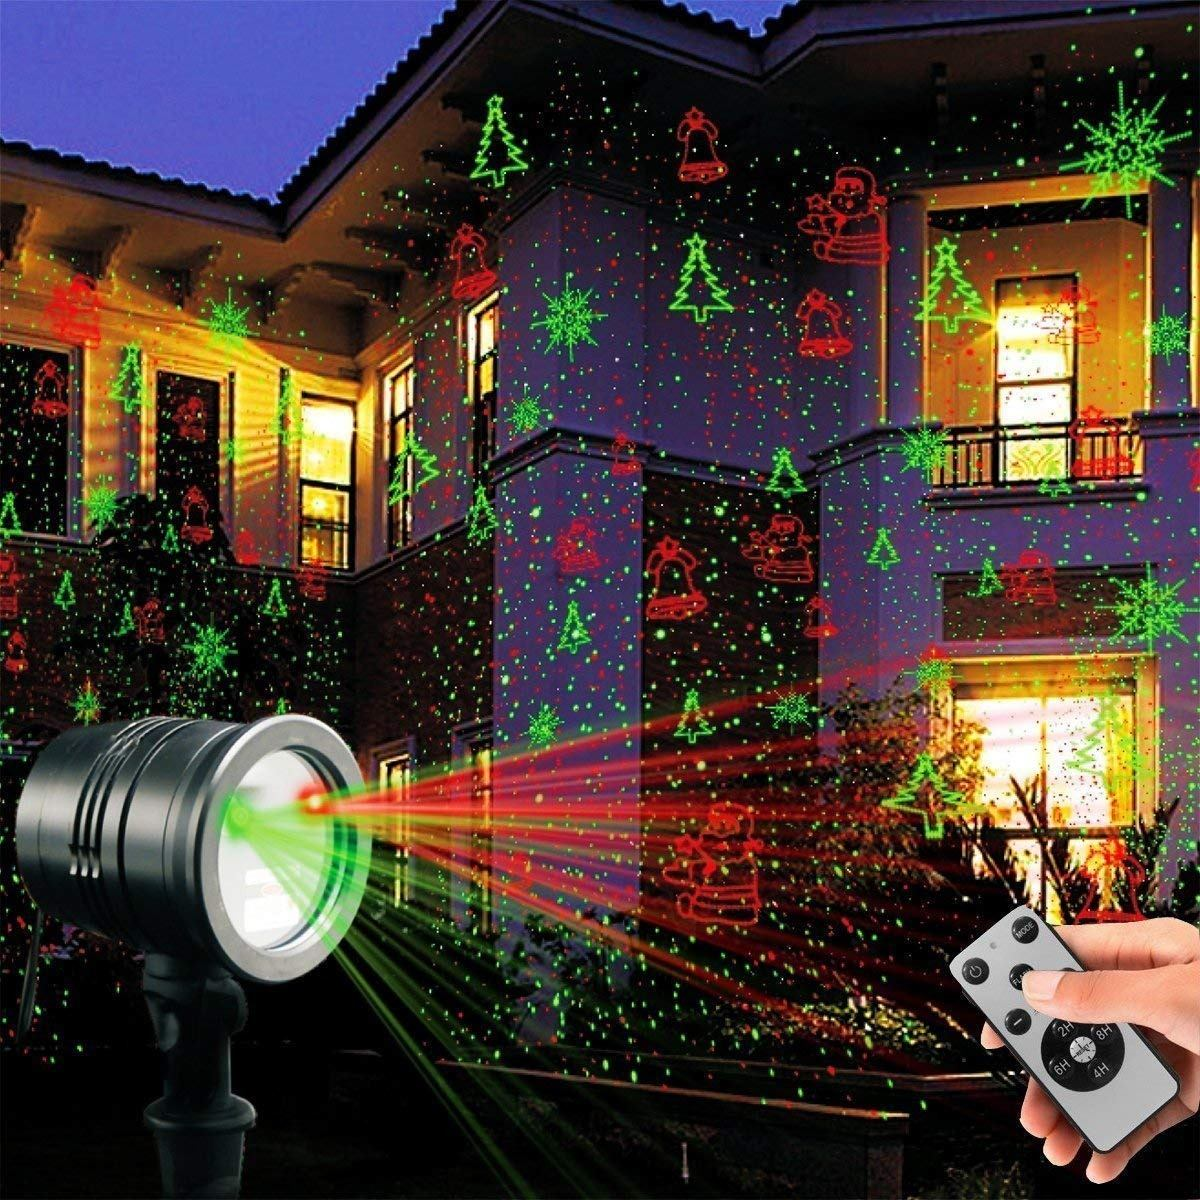 b71475d0904 Proyector Luz Láser Decoración Navidad Hogar Exterior Fiesta ...